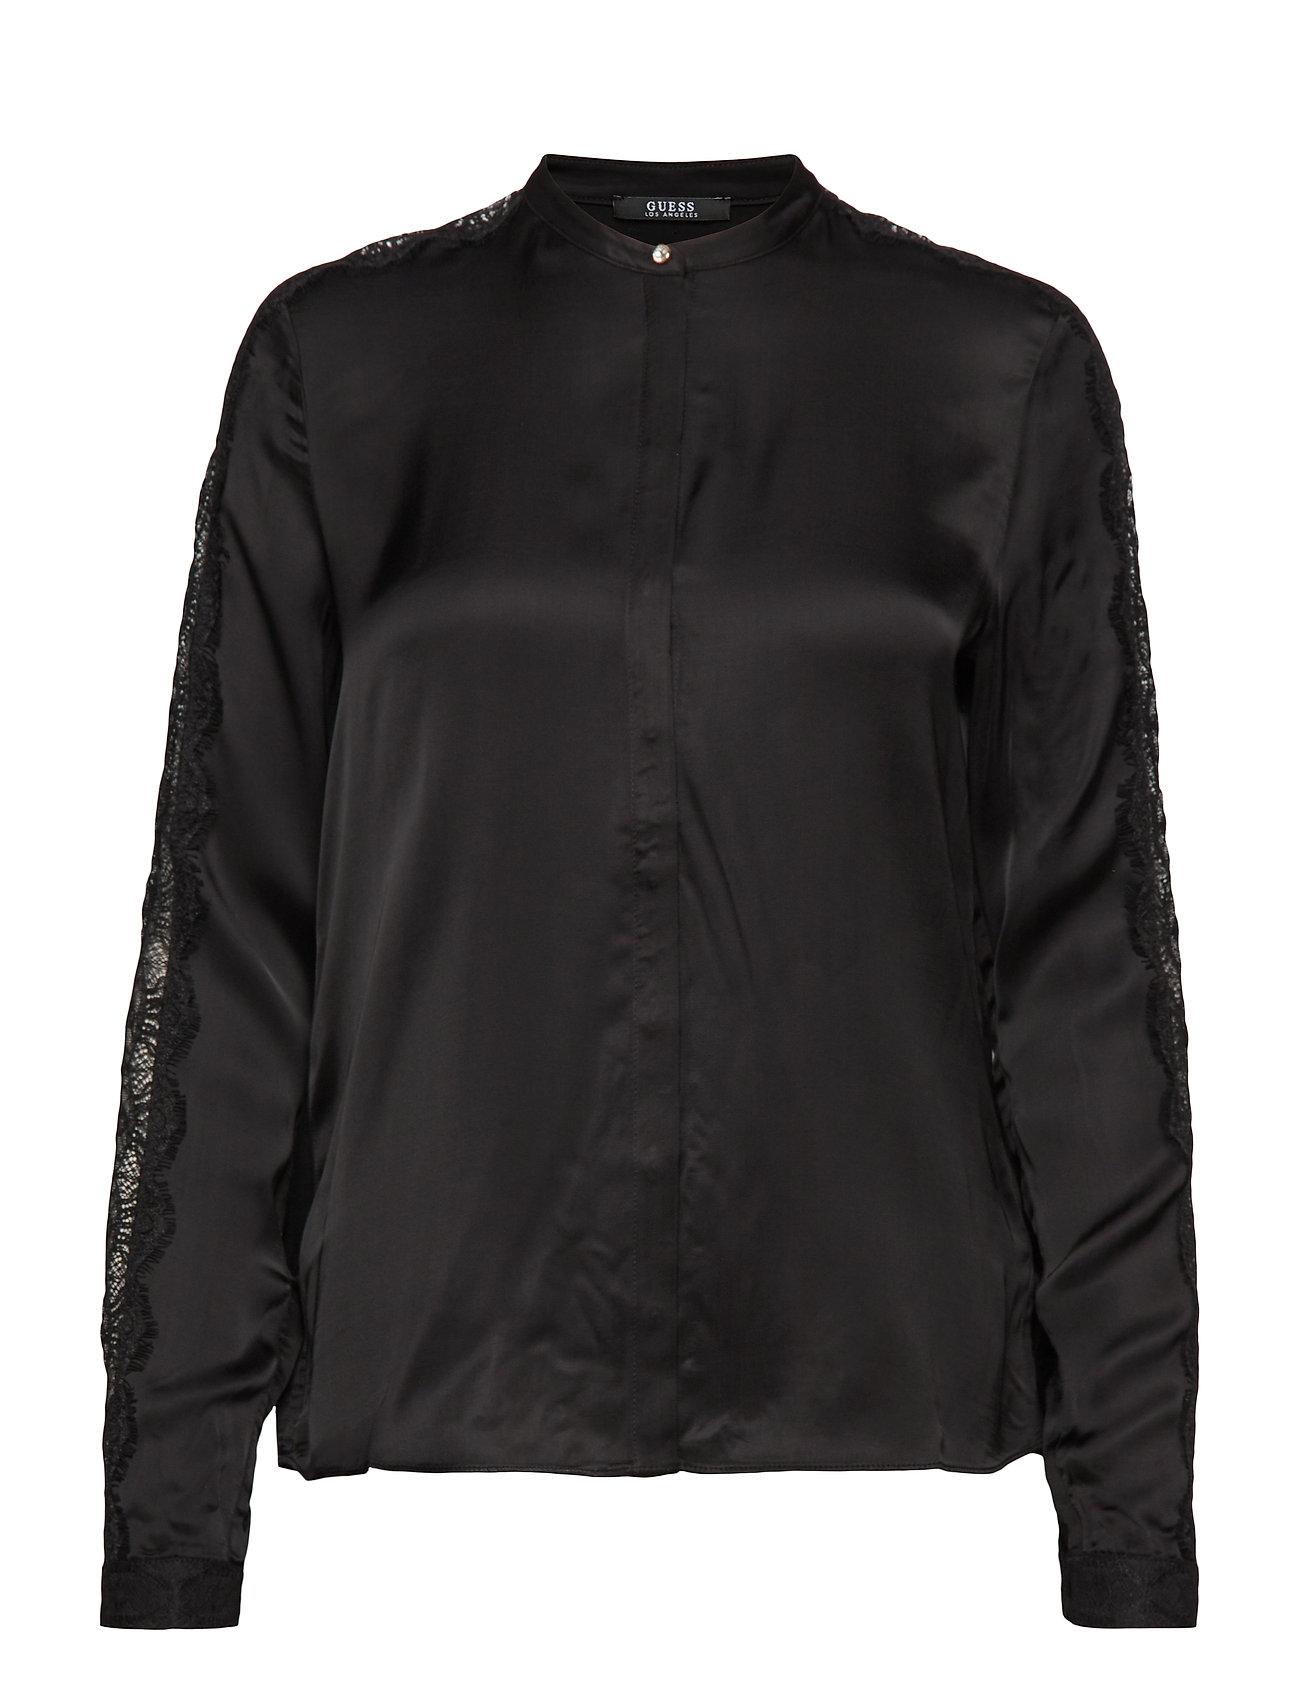 GUESS Jeans LS ORNELLA SHIRT - JET BLACK A996